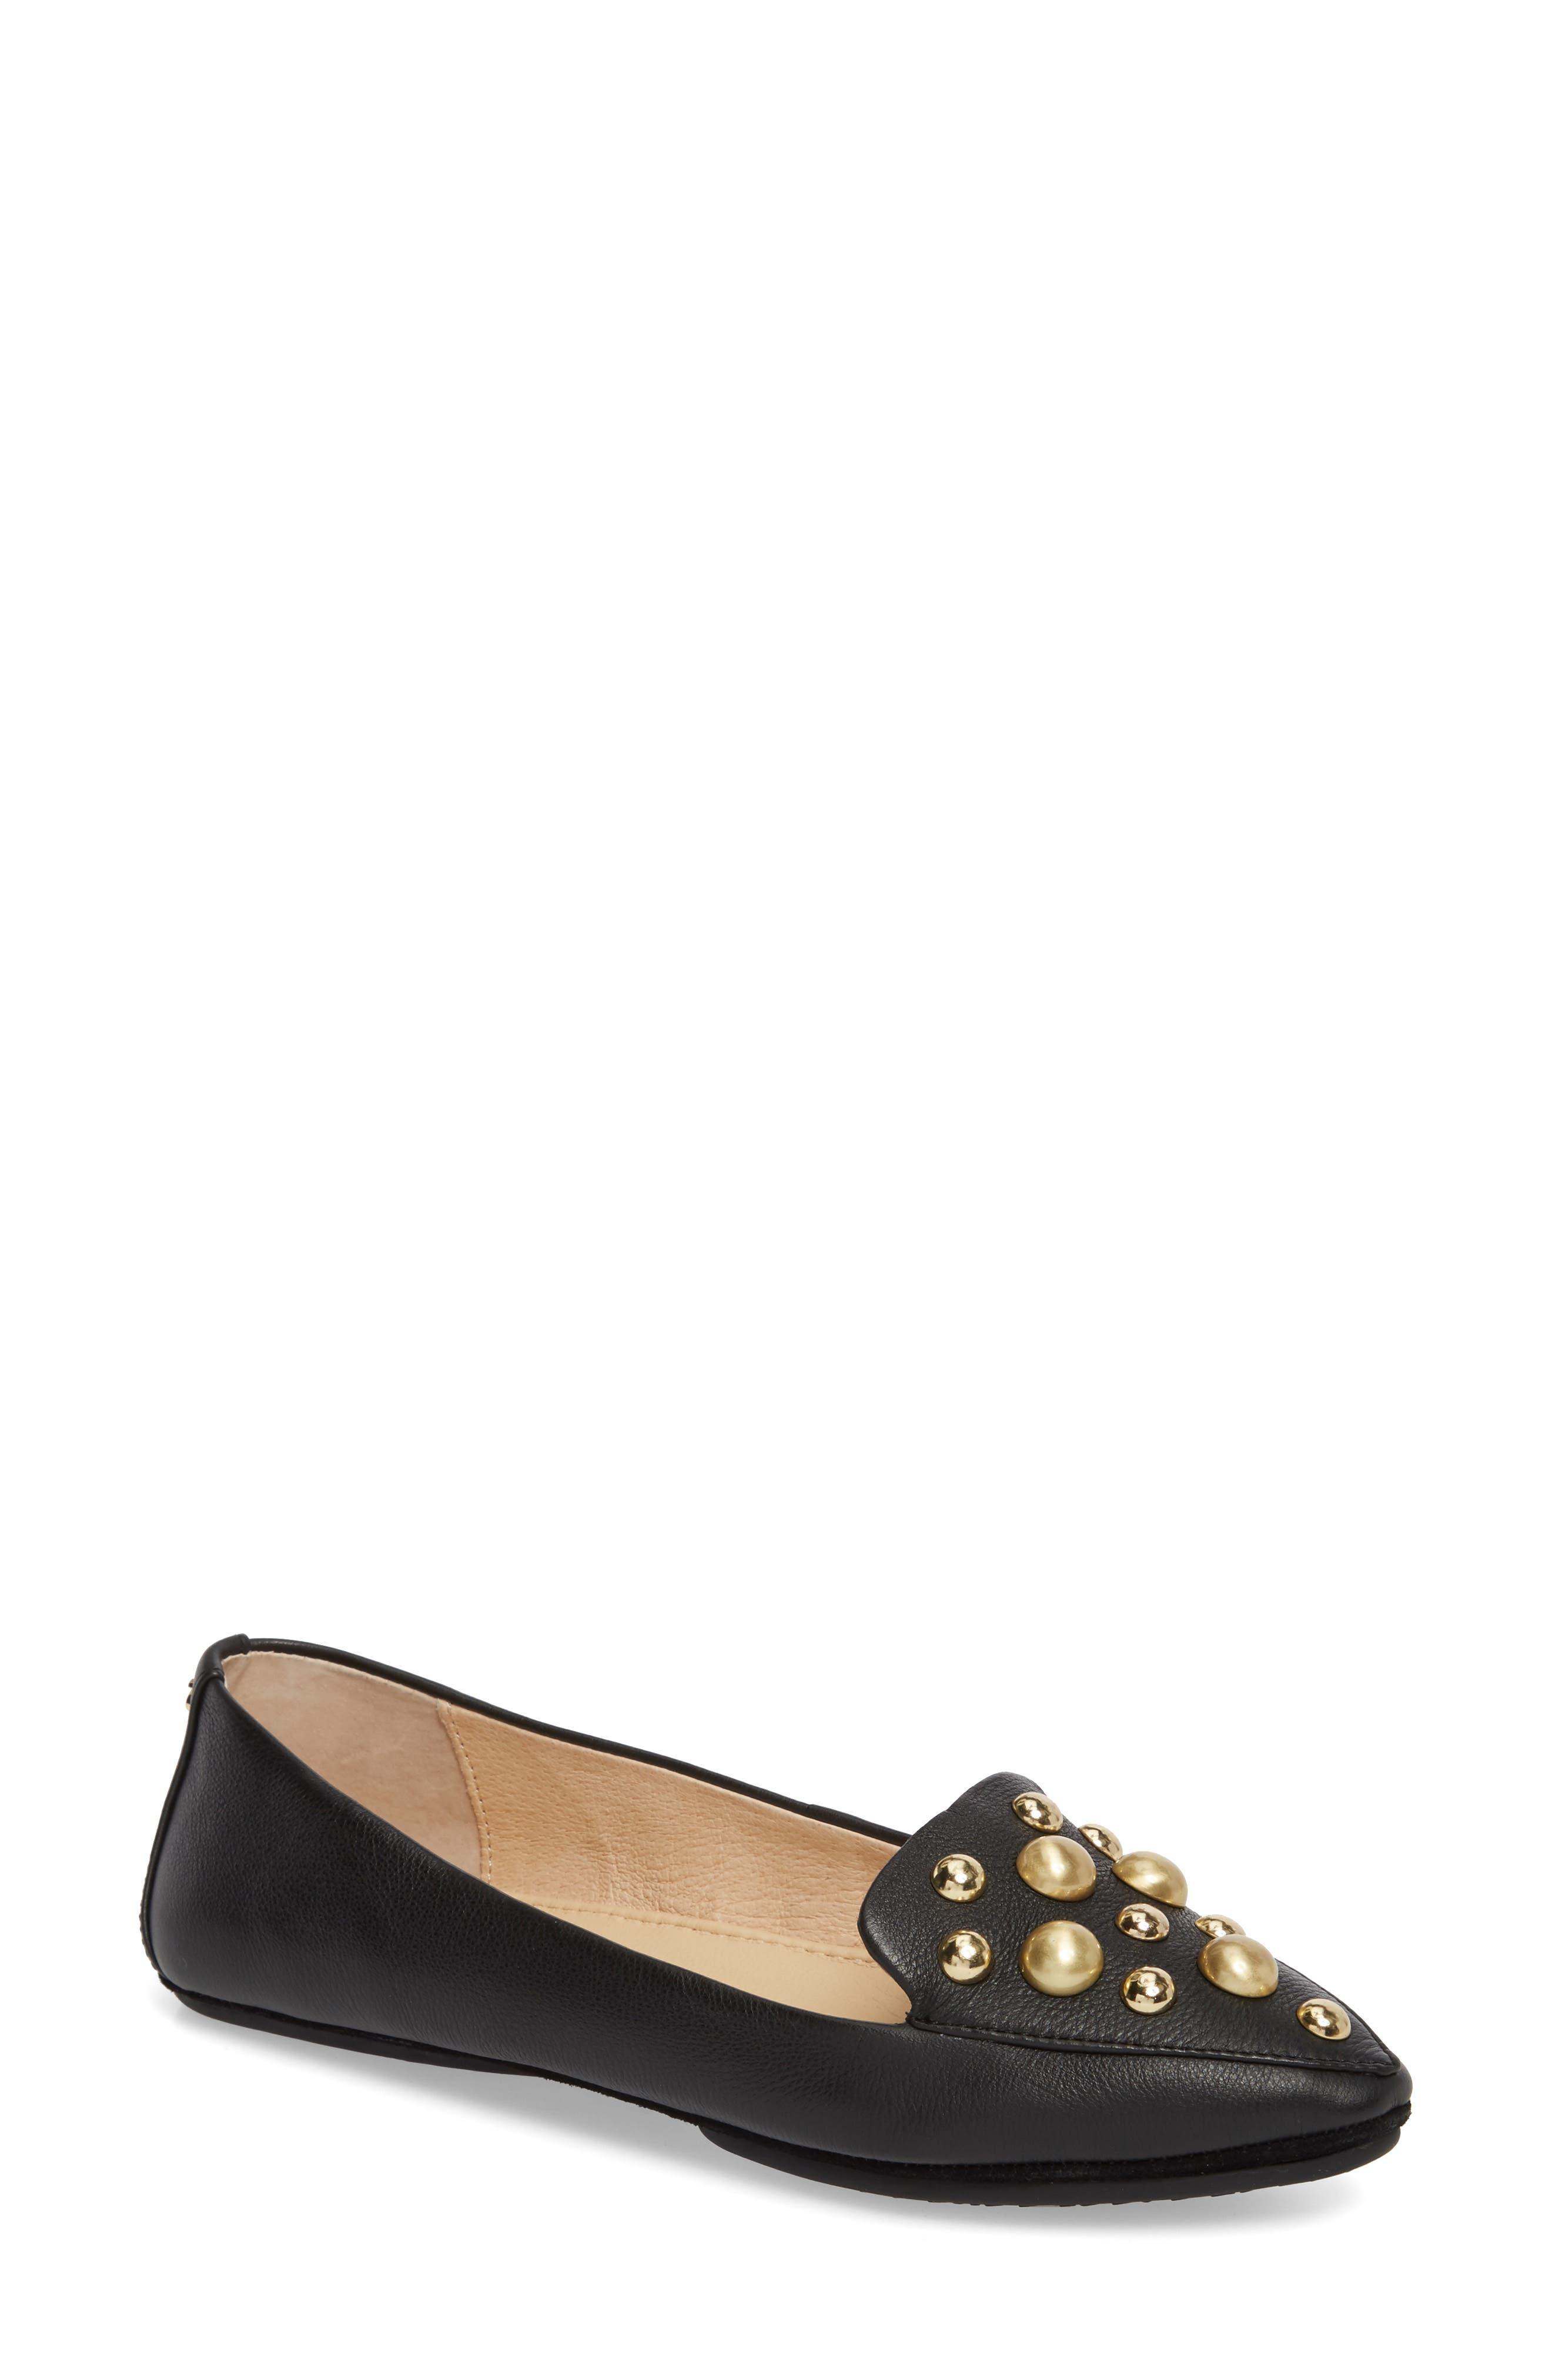 Vera Studded Loafer,                         Main,                         color, 002